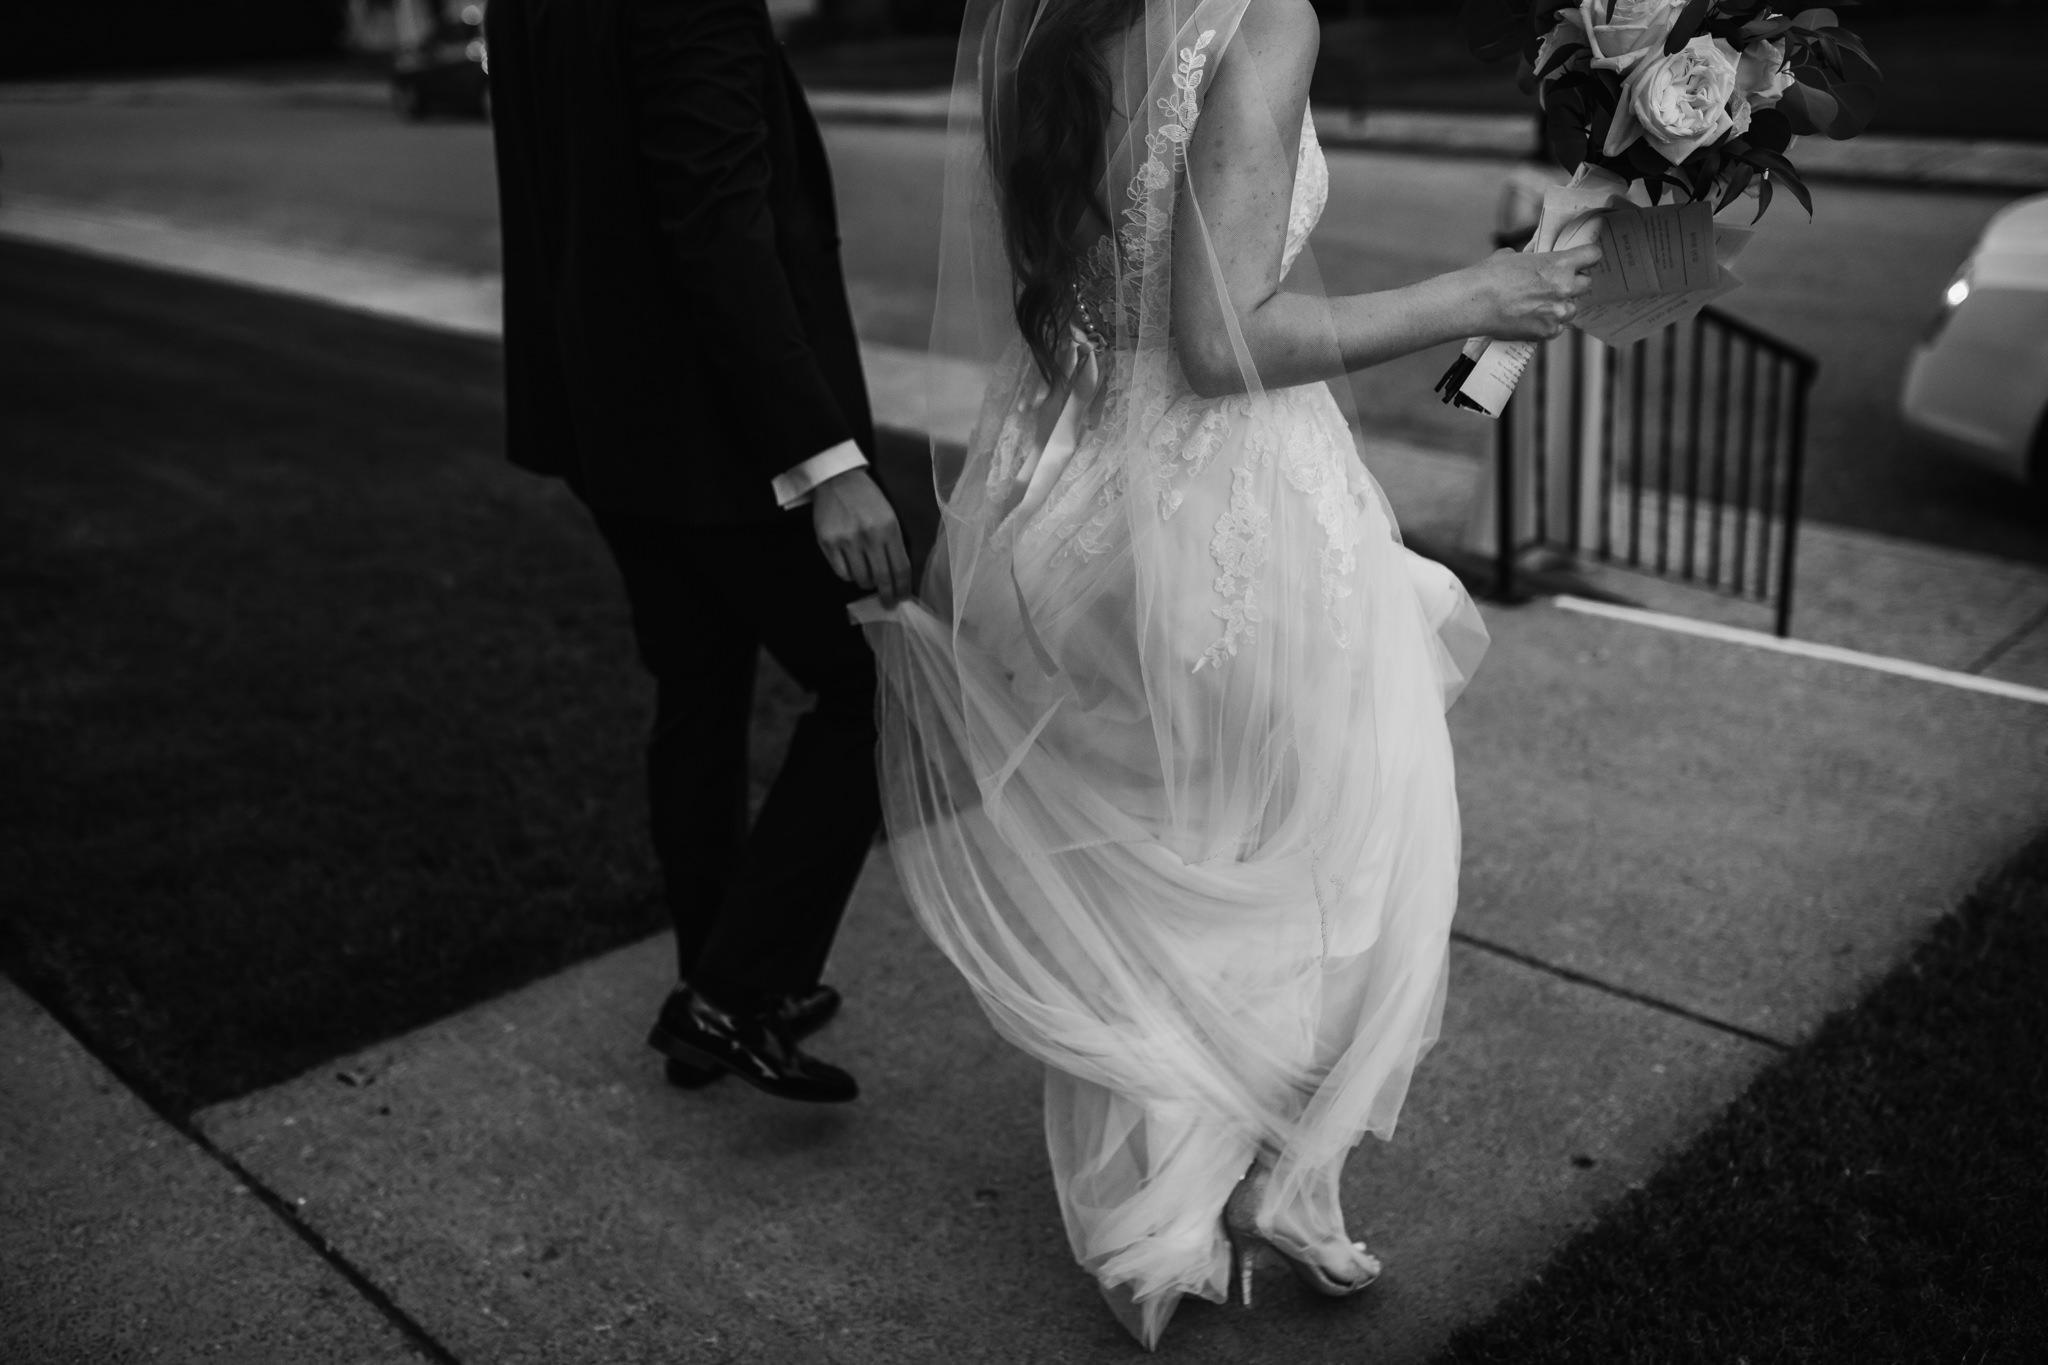 cassie-cook-photography-memphis-wedding-photographer-the-atrium-at-overton-square-73.jpg